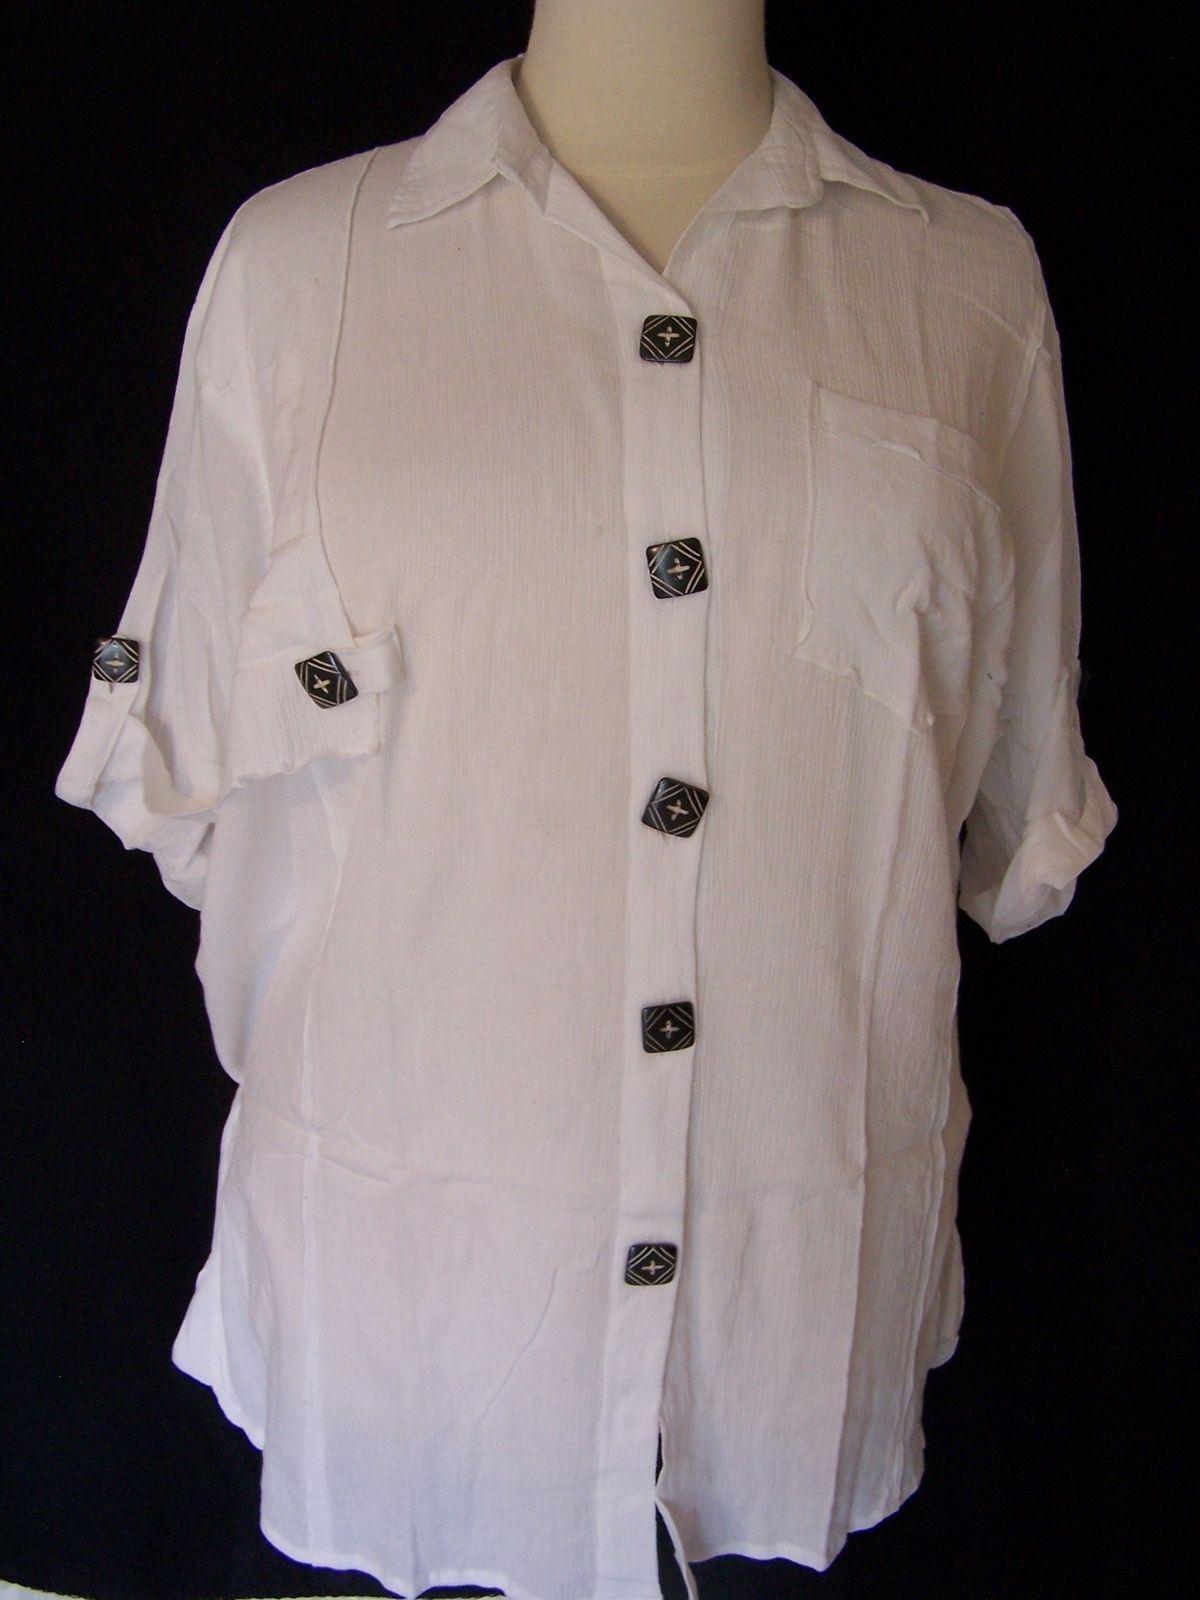 Plus Größe Chai Latte Blouse by We Be Bop Big Shirt 409 Weiß Crinkle Cotton Top